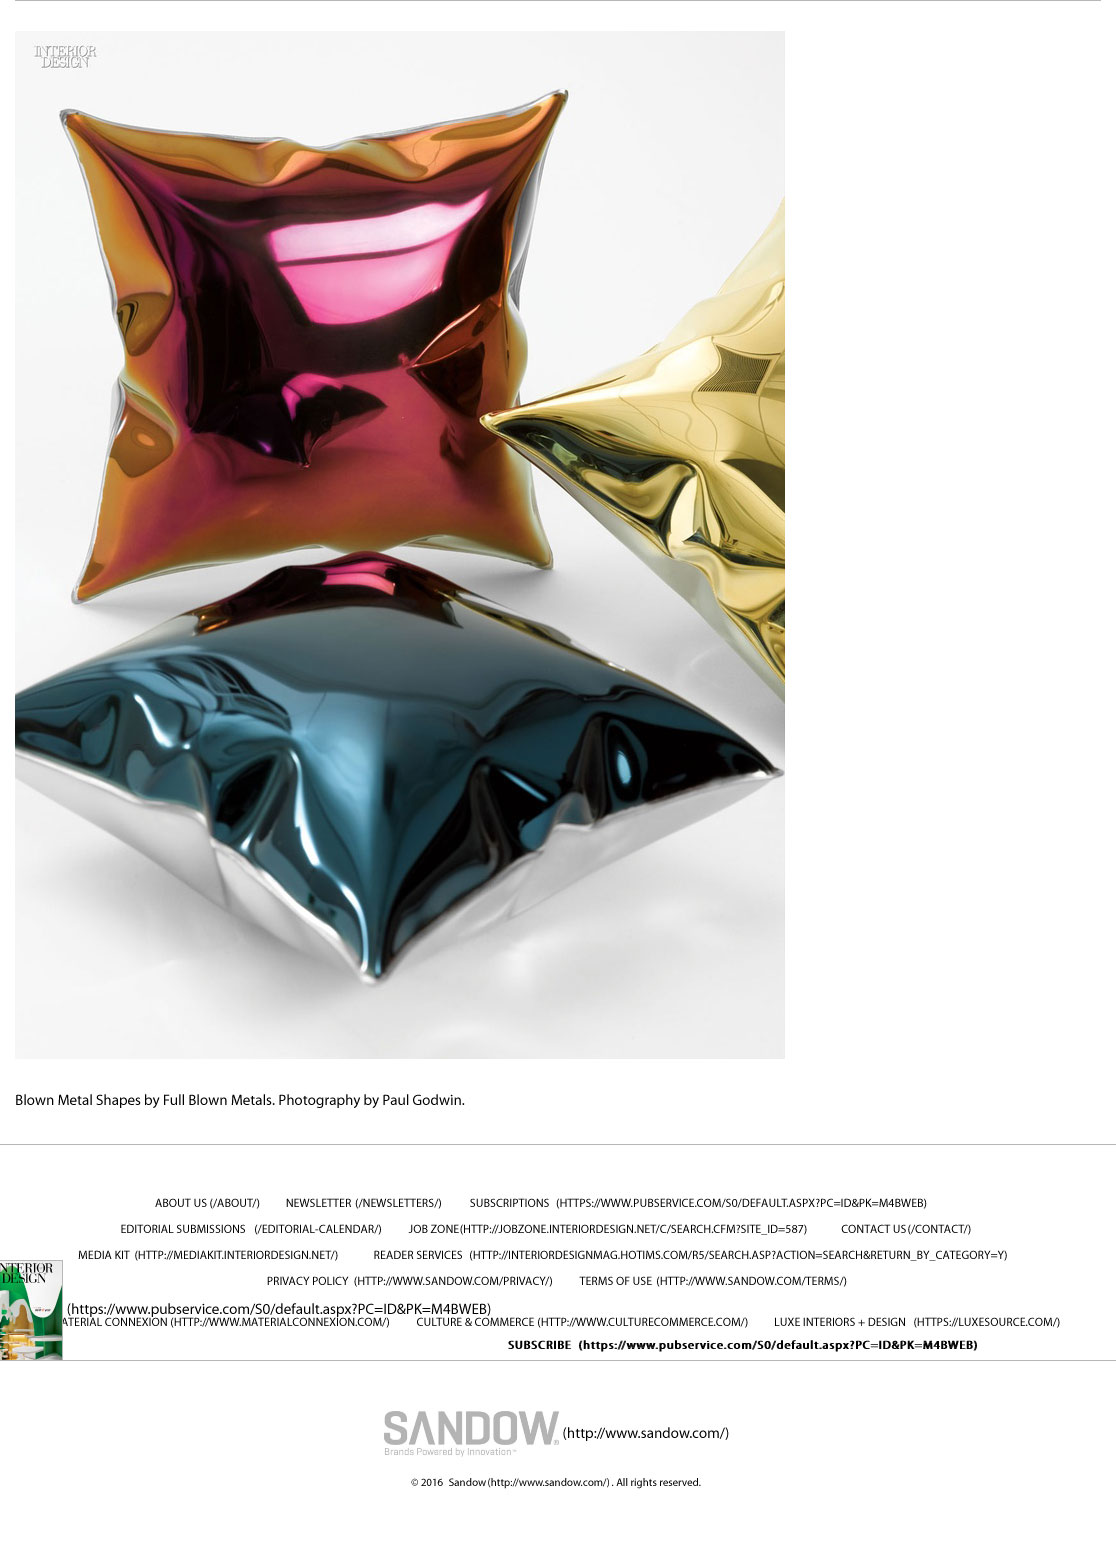 7-New-Materials-Resist-Heat,-Water-and-More.jpg